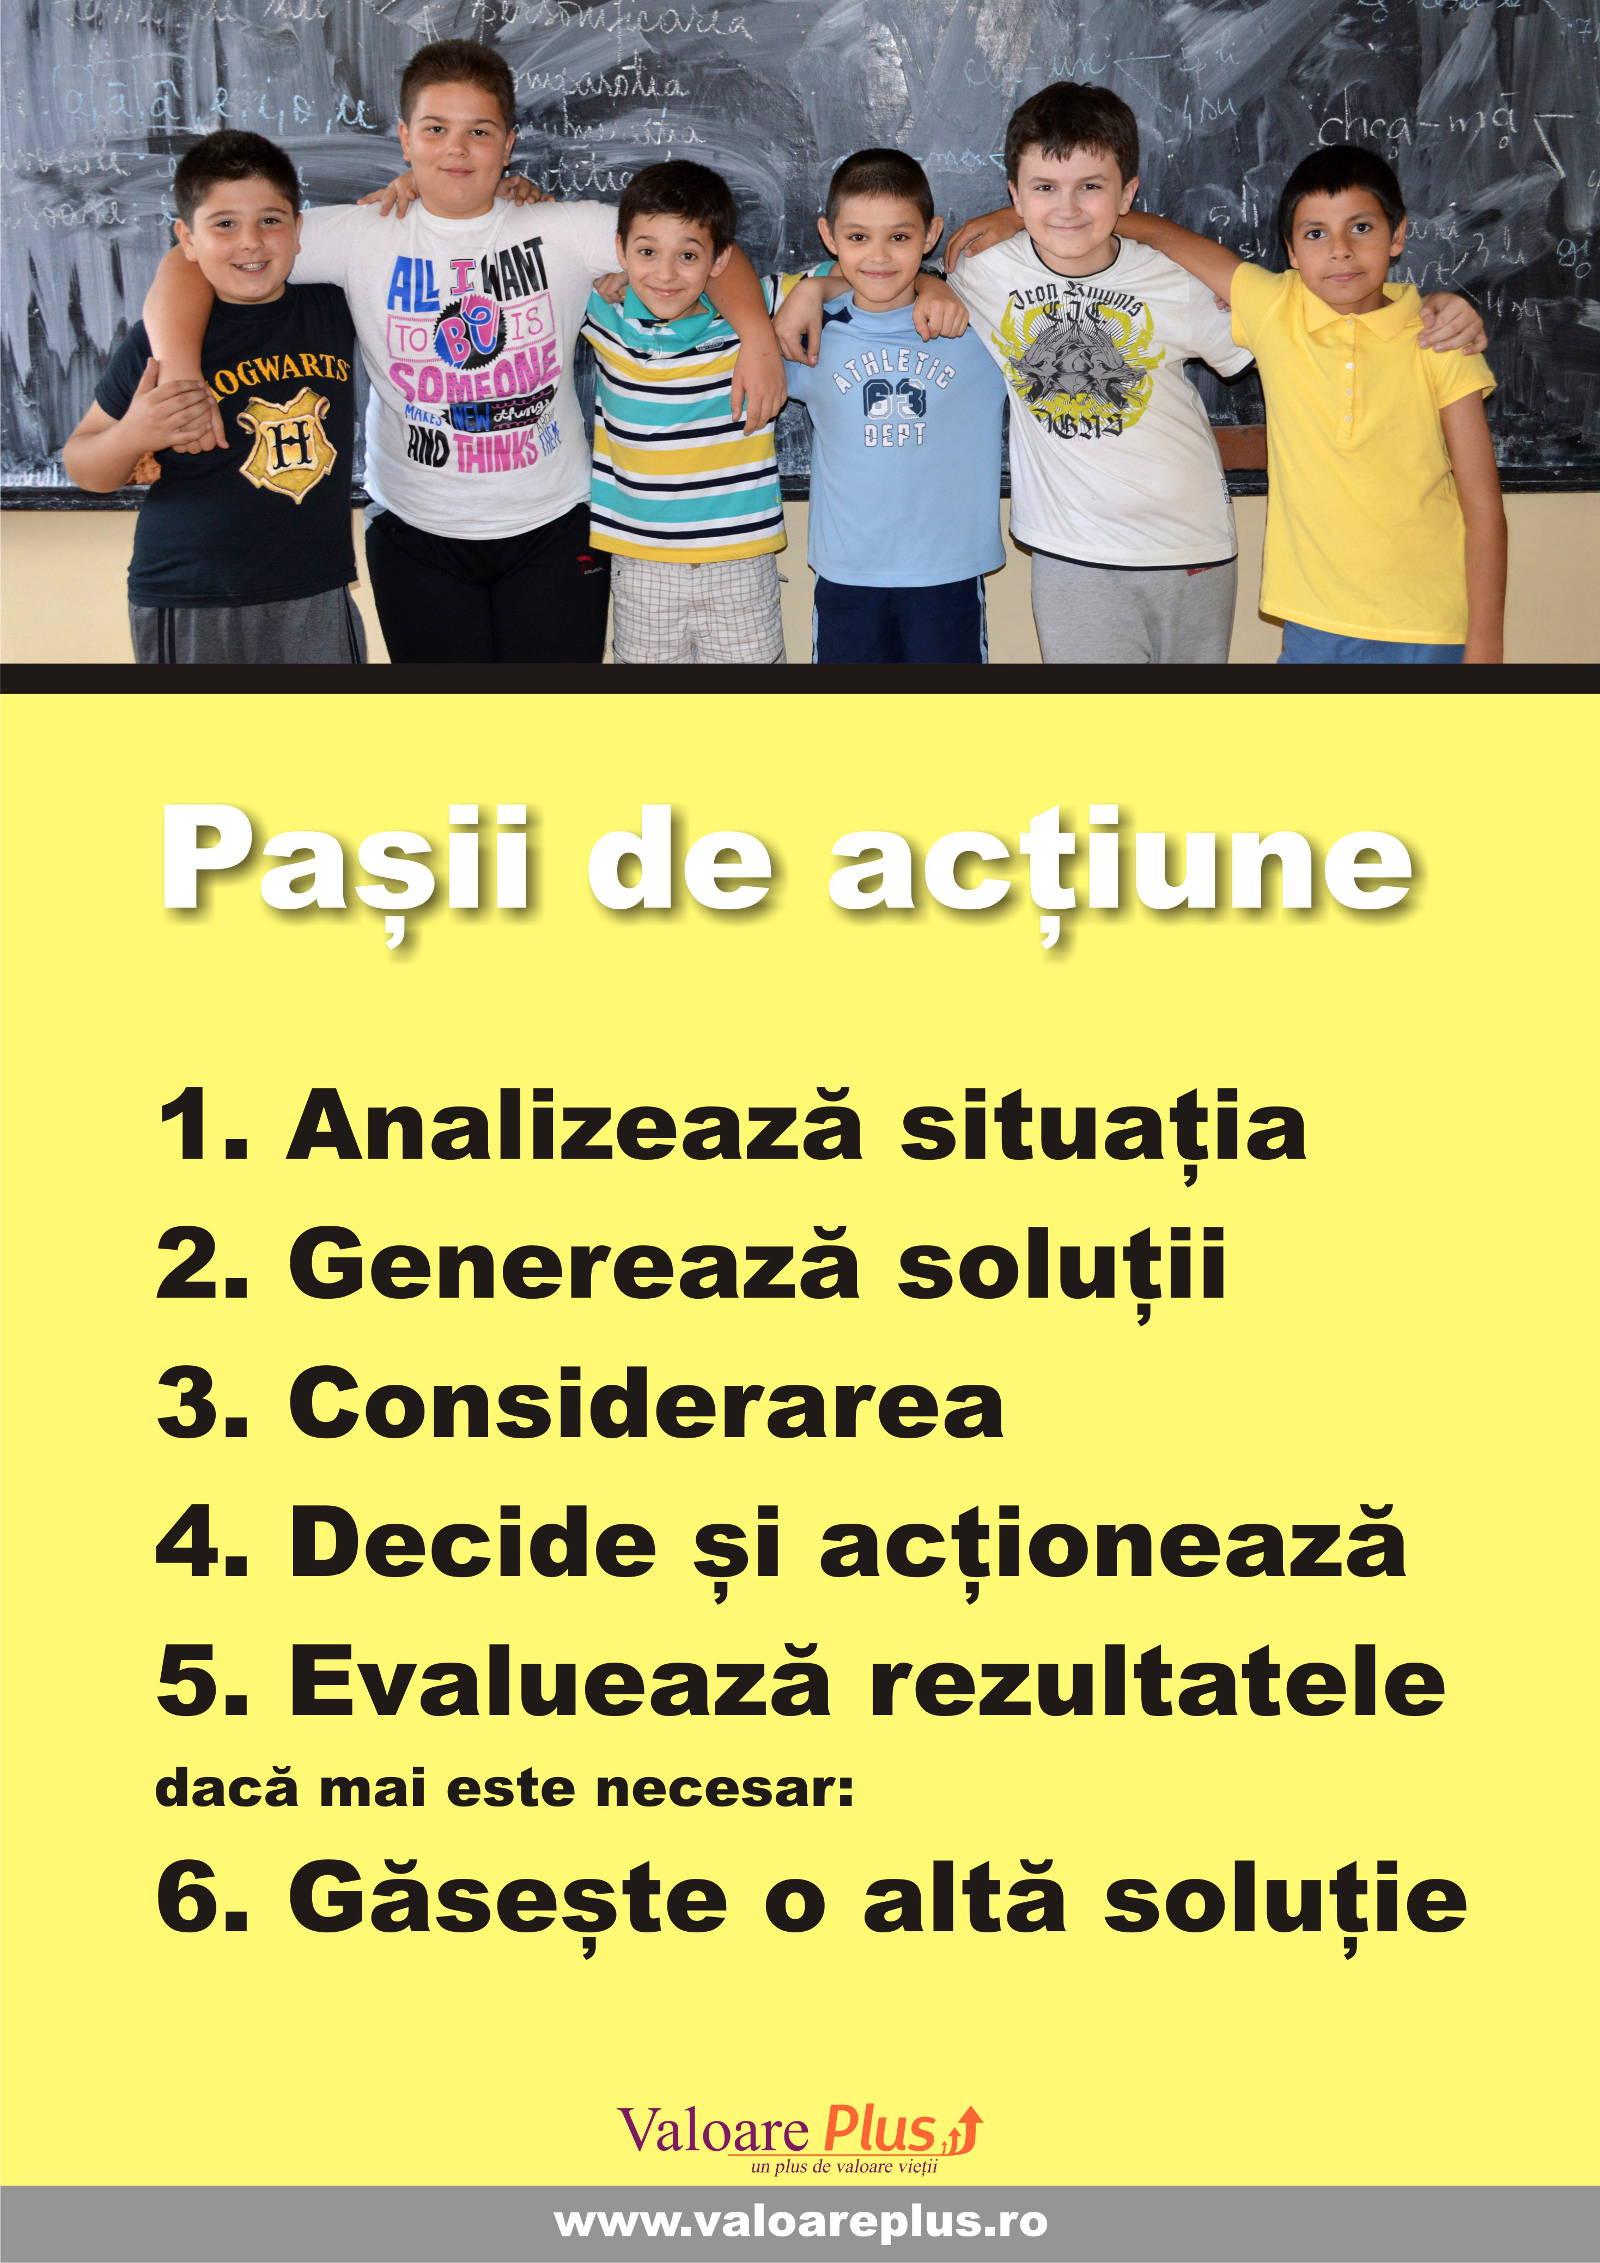 posterul cu pasii de actiune